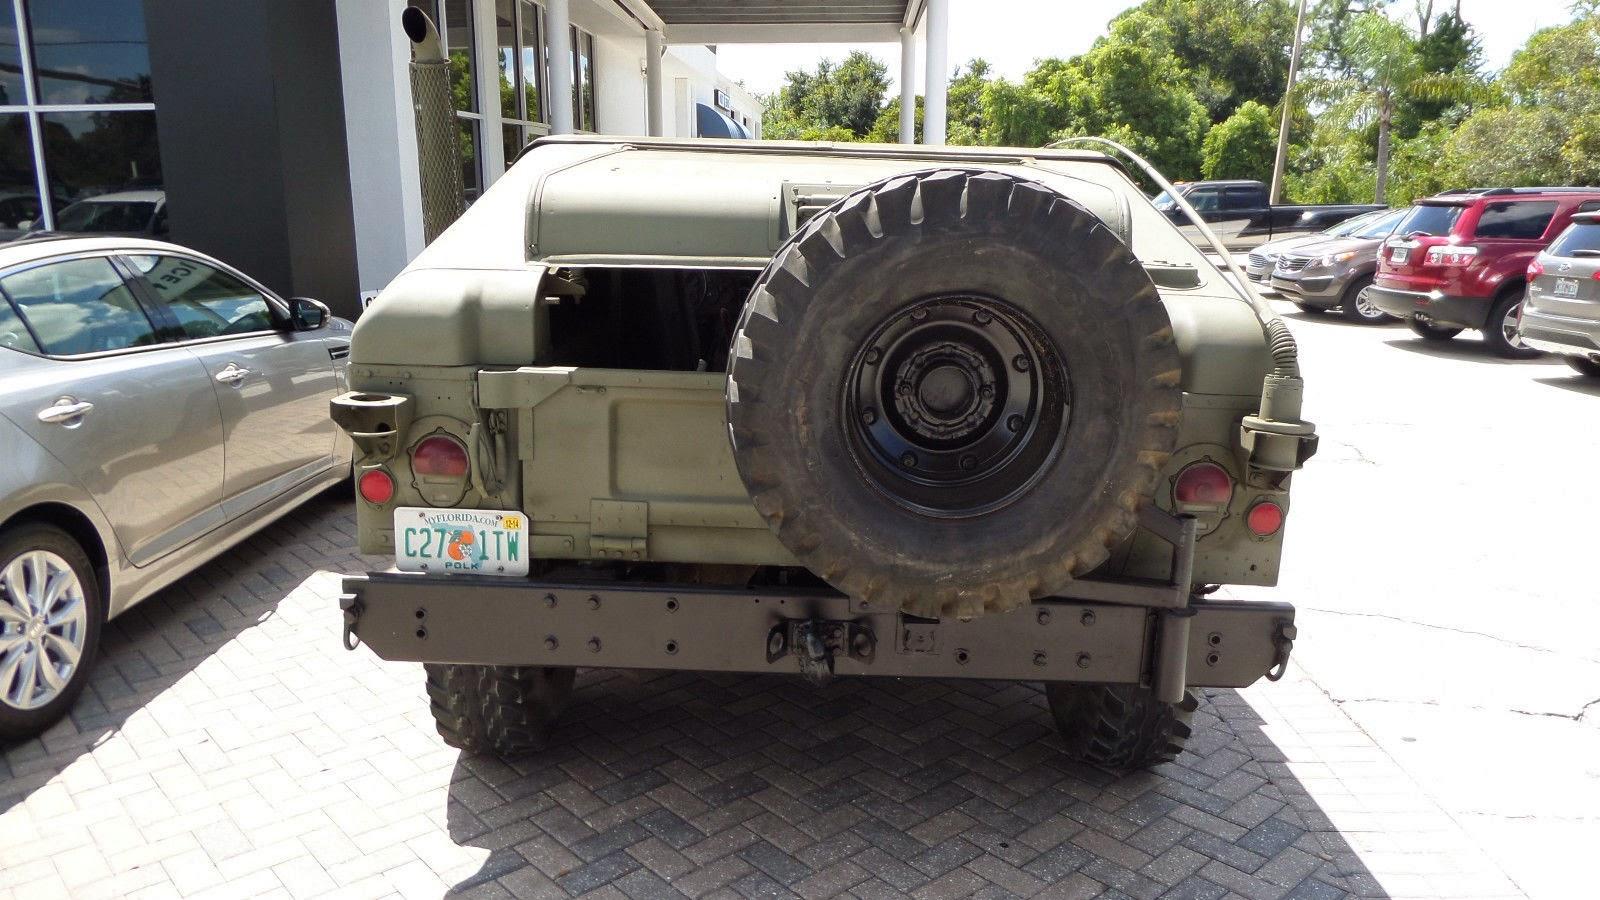 1986 American General Humvee Slant Back - 4x4 Cars